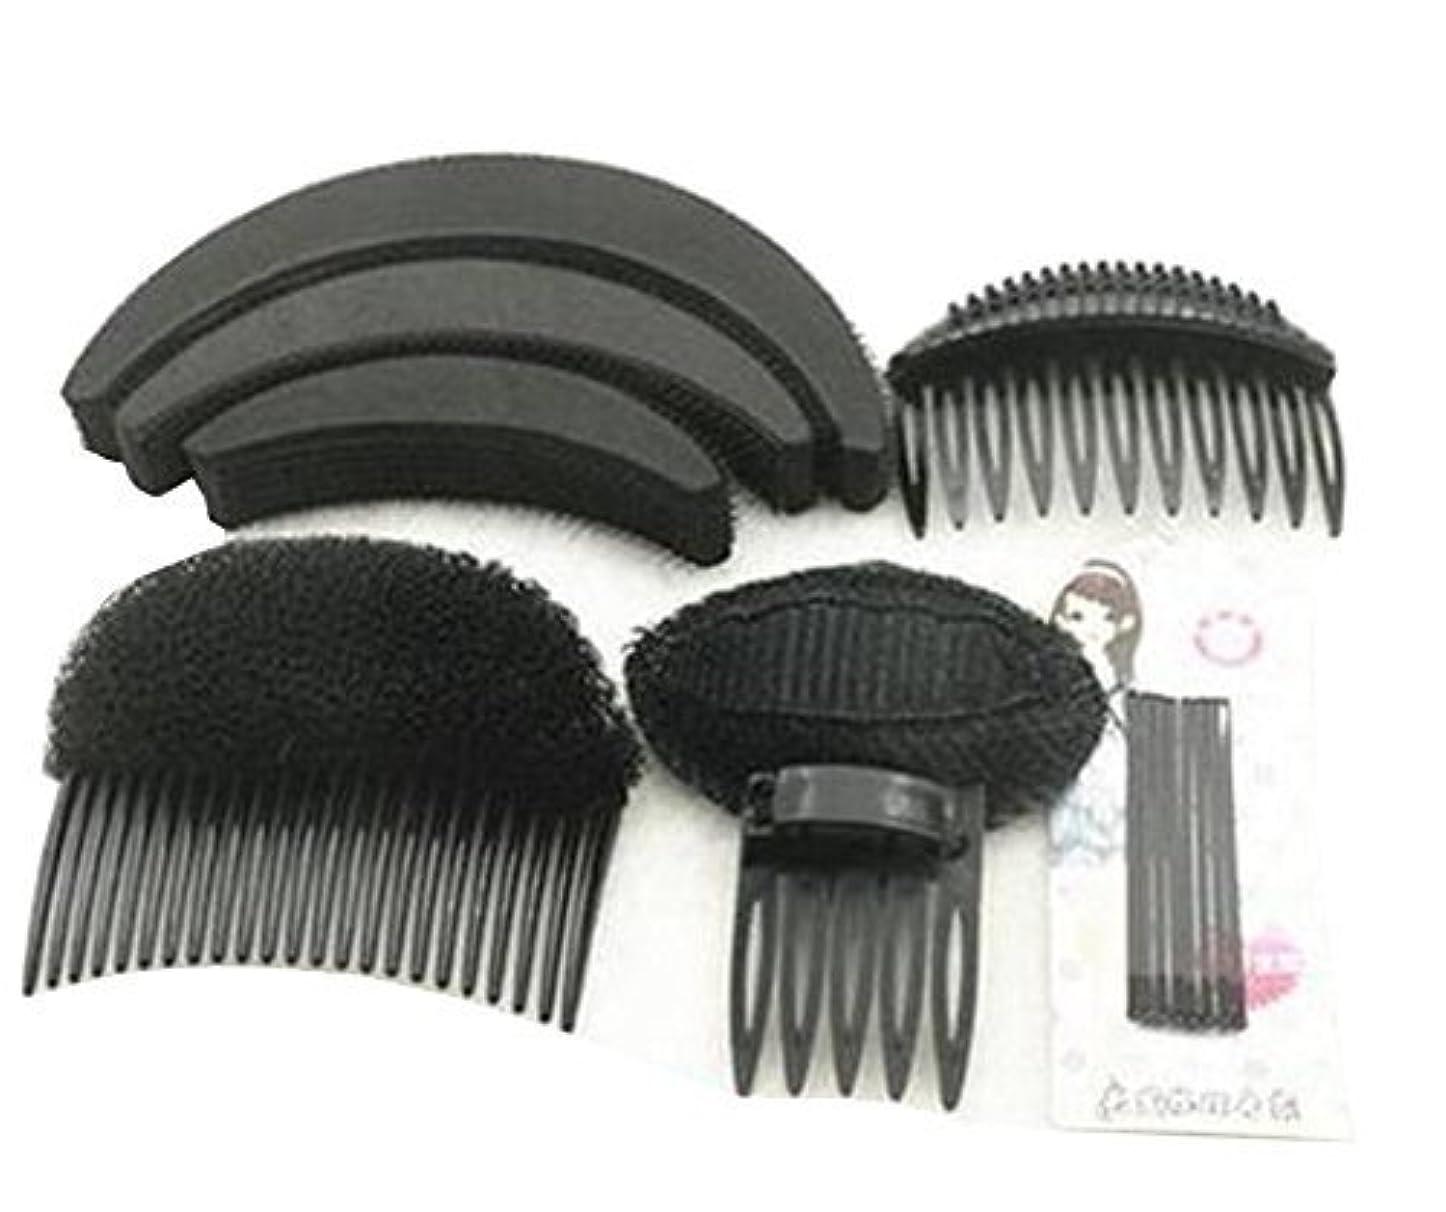 雰囲気蒸気記念品1 Set As picture Shown Hair Styler Styling Tool DIY Hairpin Bump Up Inserts Base Comb Bumpits Bump Foam Pads Braiding...